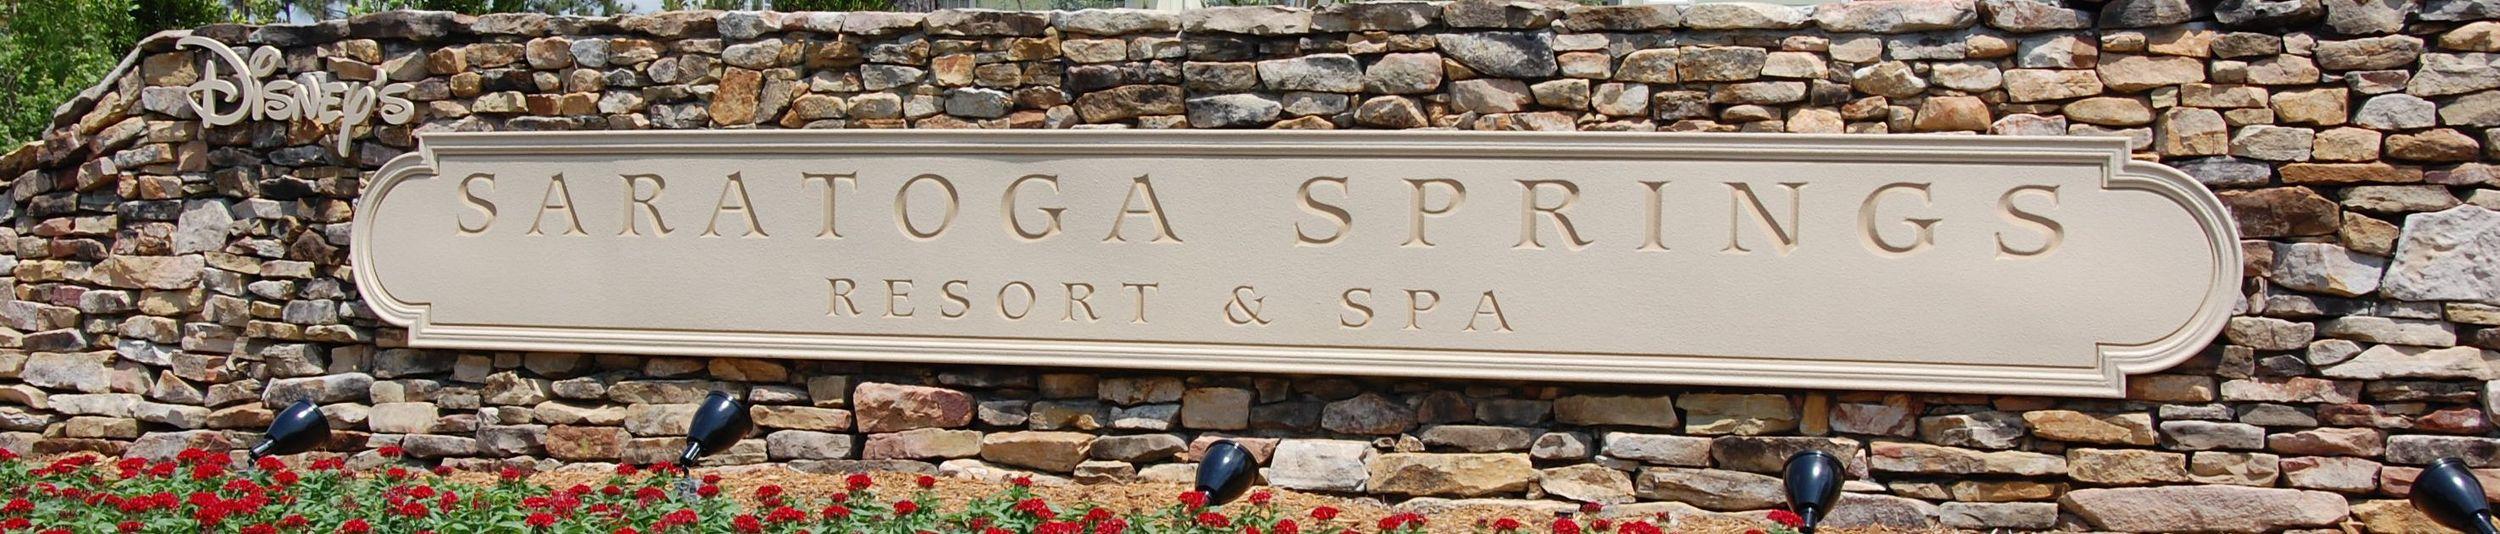 Disney's Saratoga Springs